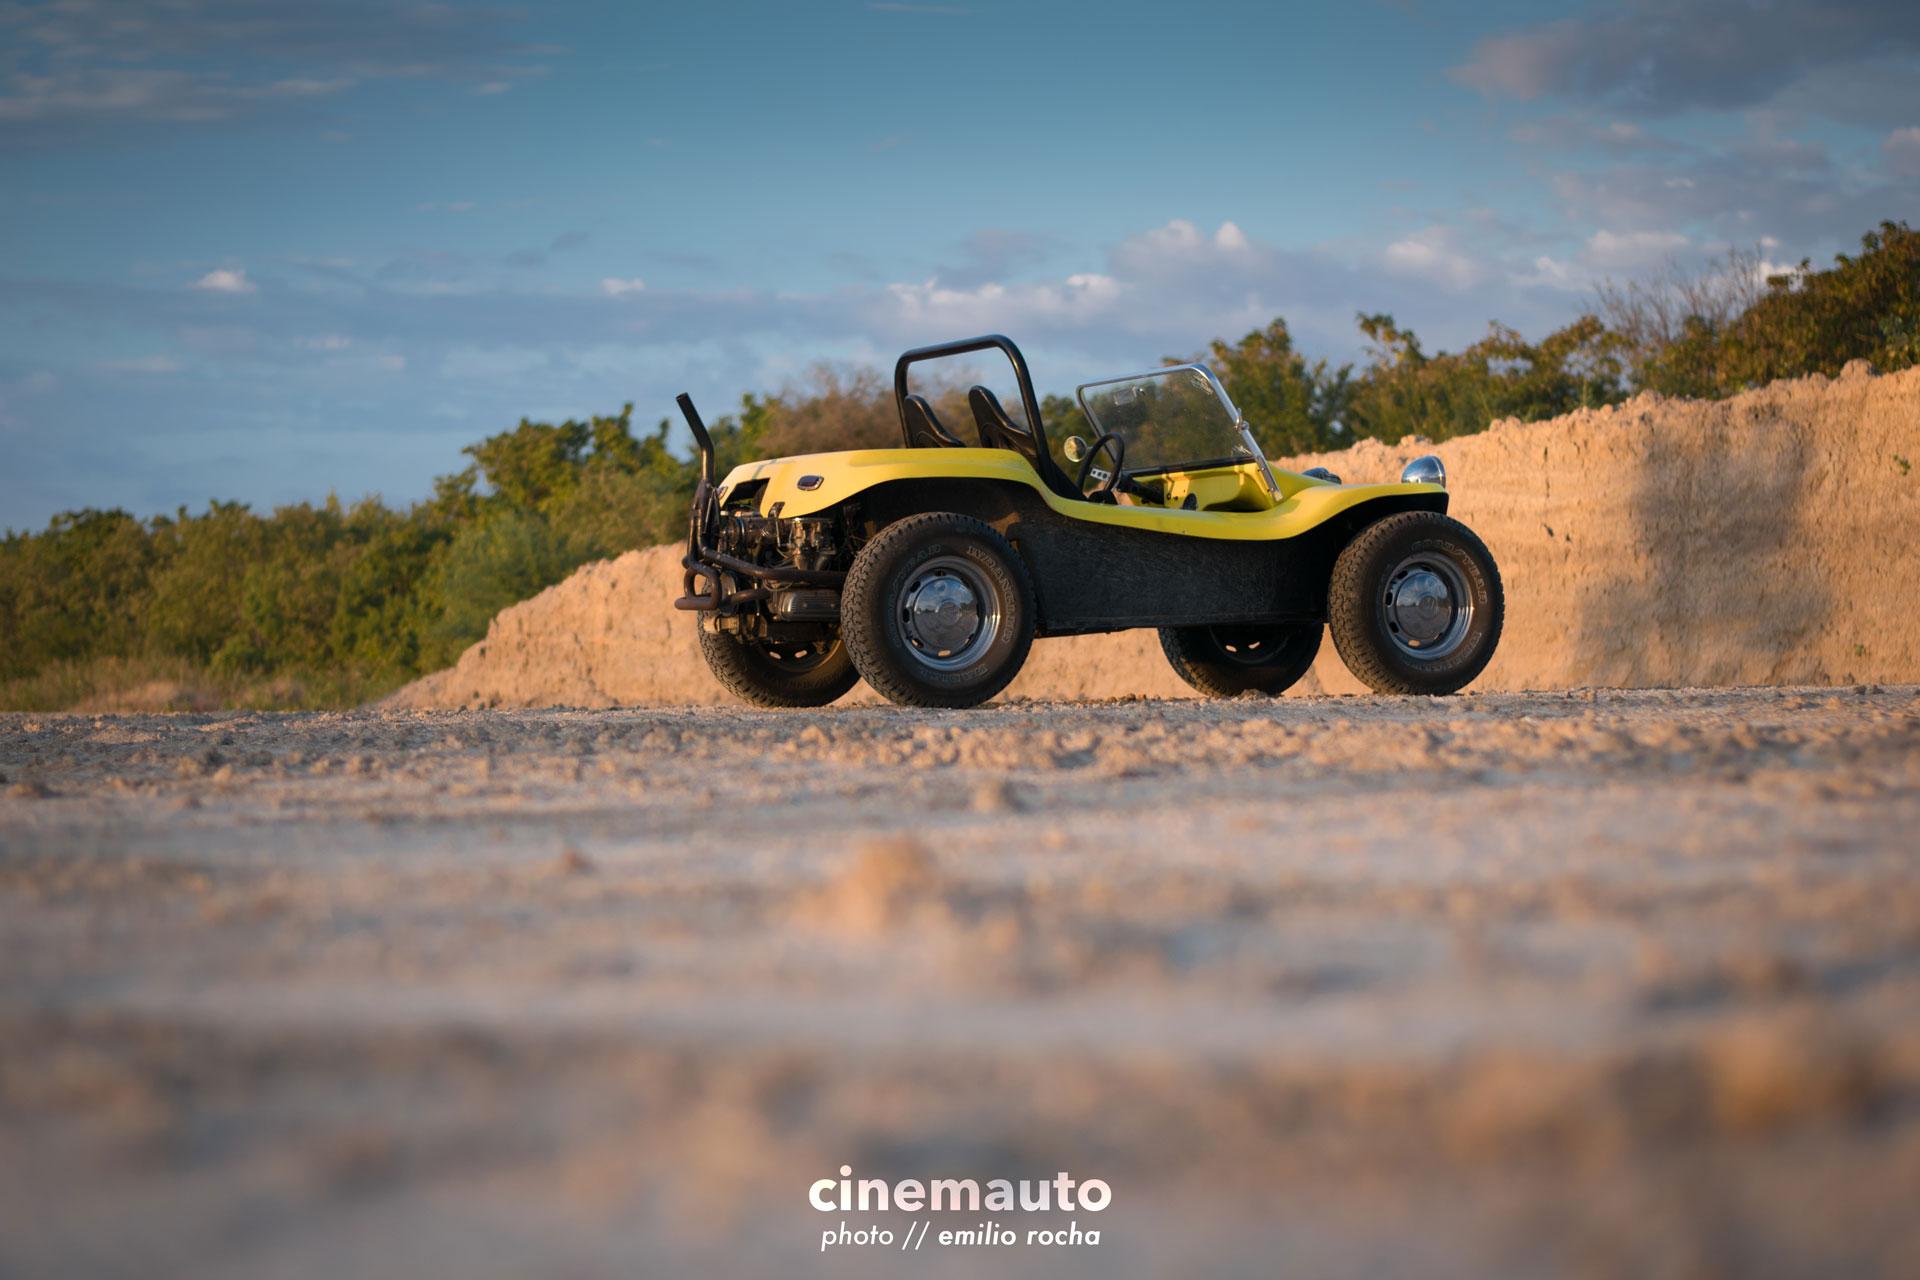 wichita-automotive-photography-cinemauto-gv1.jpg